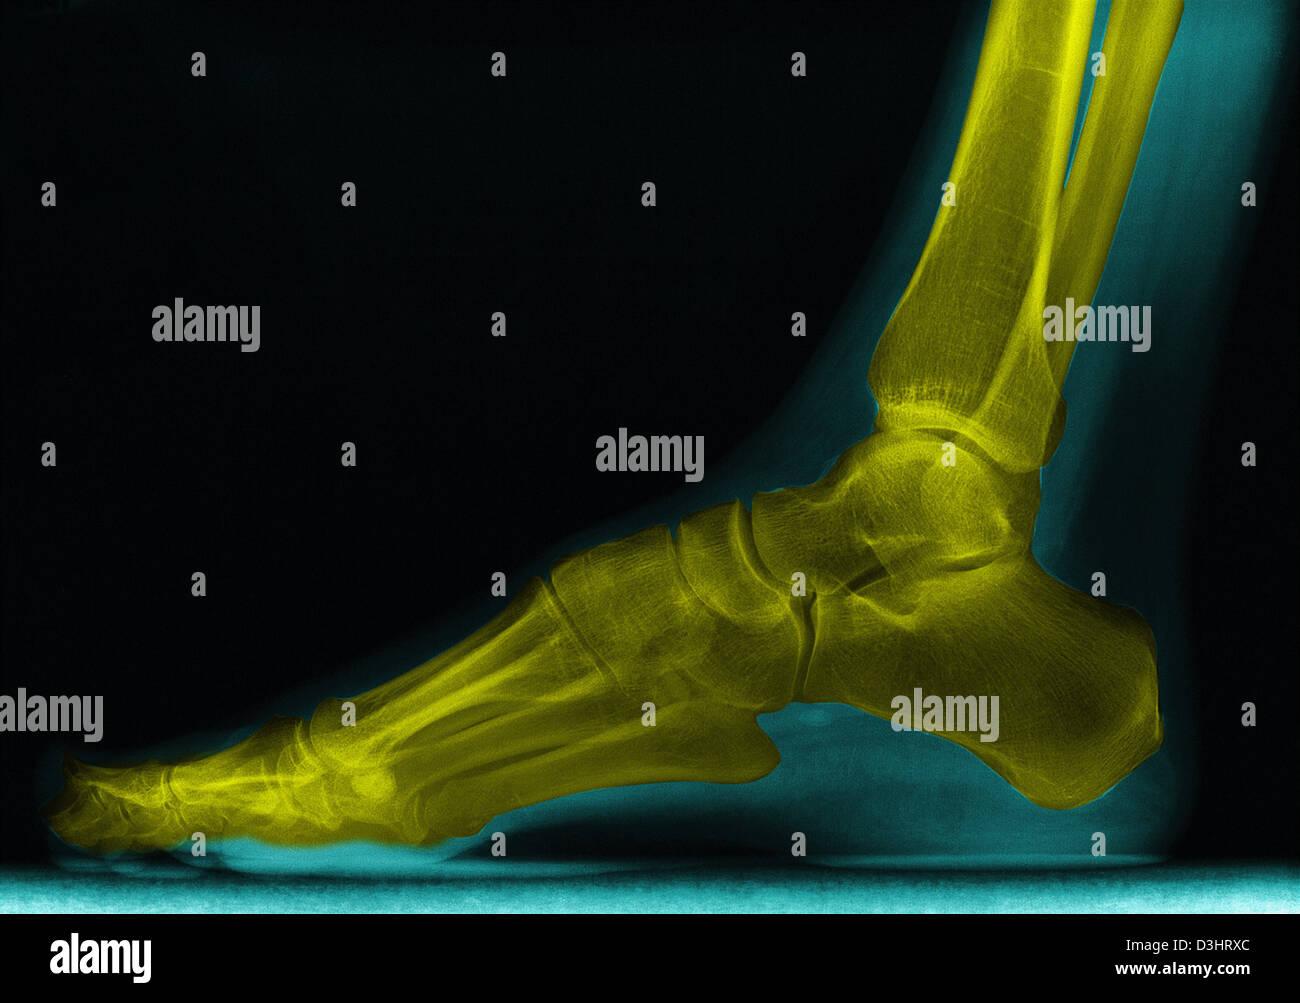 FOOT, X-RAY - Stock Image